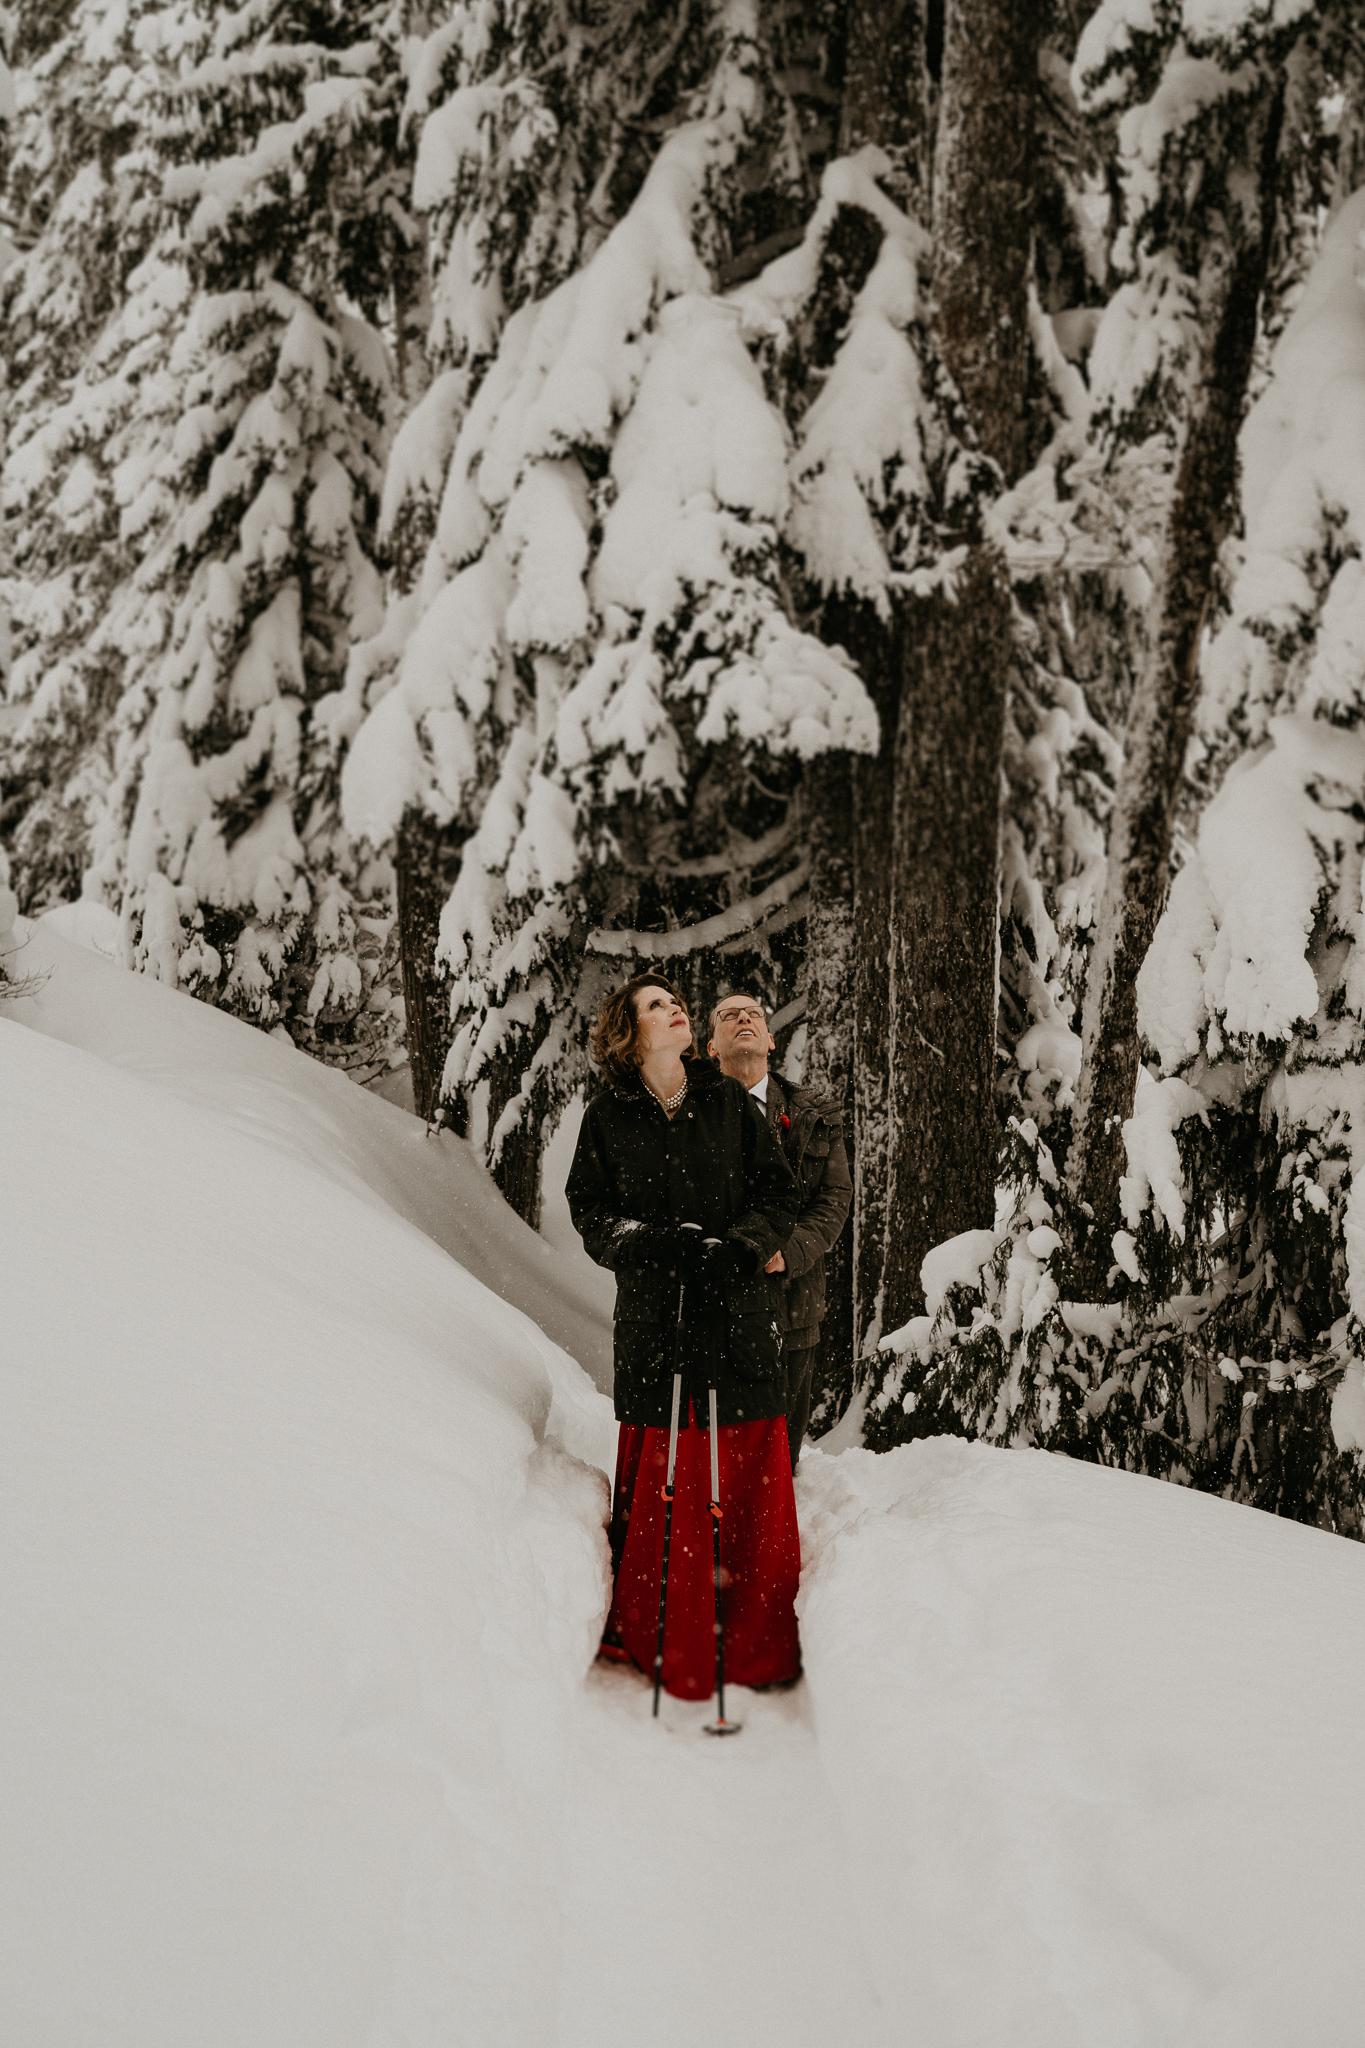 Mount-Rainier-Snow-Winter-Elopement-Adventure-Photographer2-59.jpg